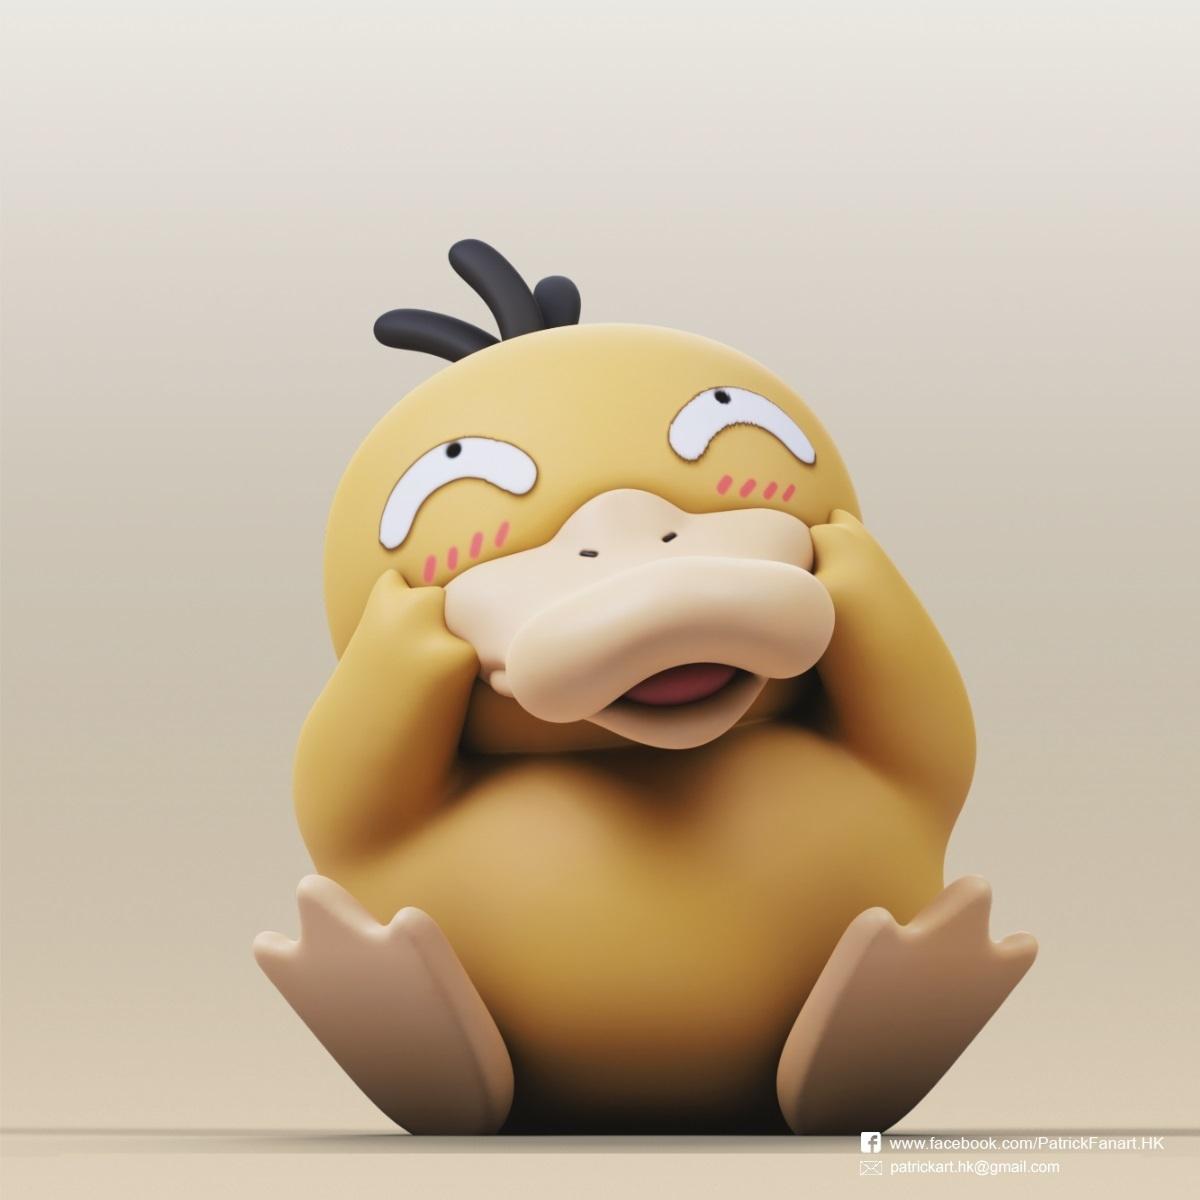 Psyduck_2.jpg Download free STL file Psyduck(Pokemon) • Design to 3D print, PatrickFanart